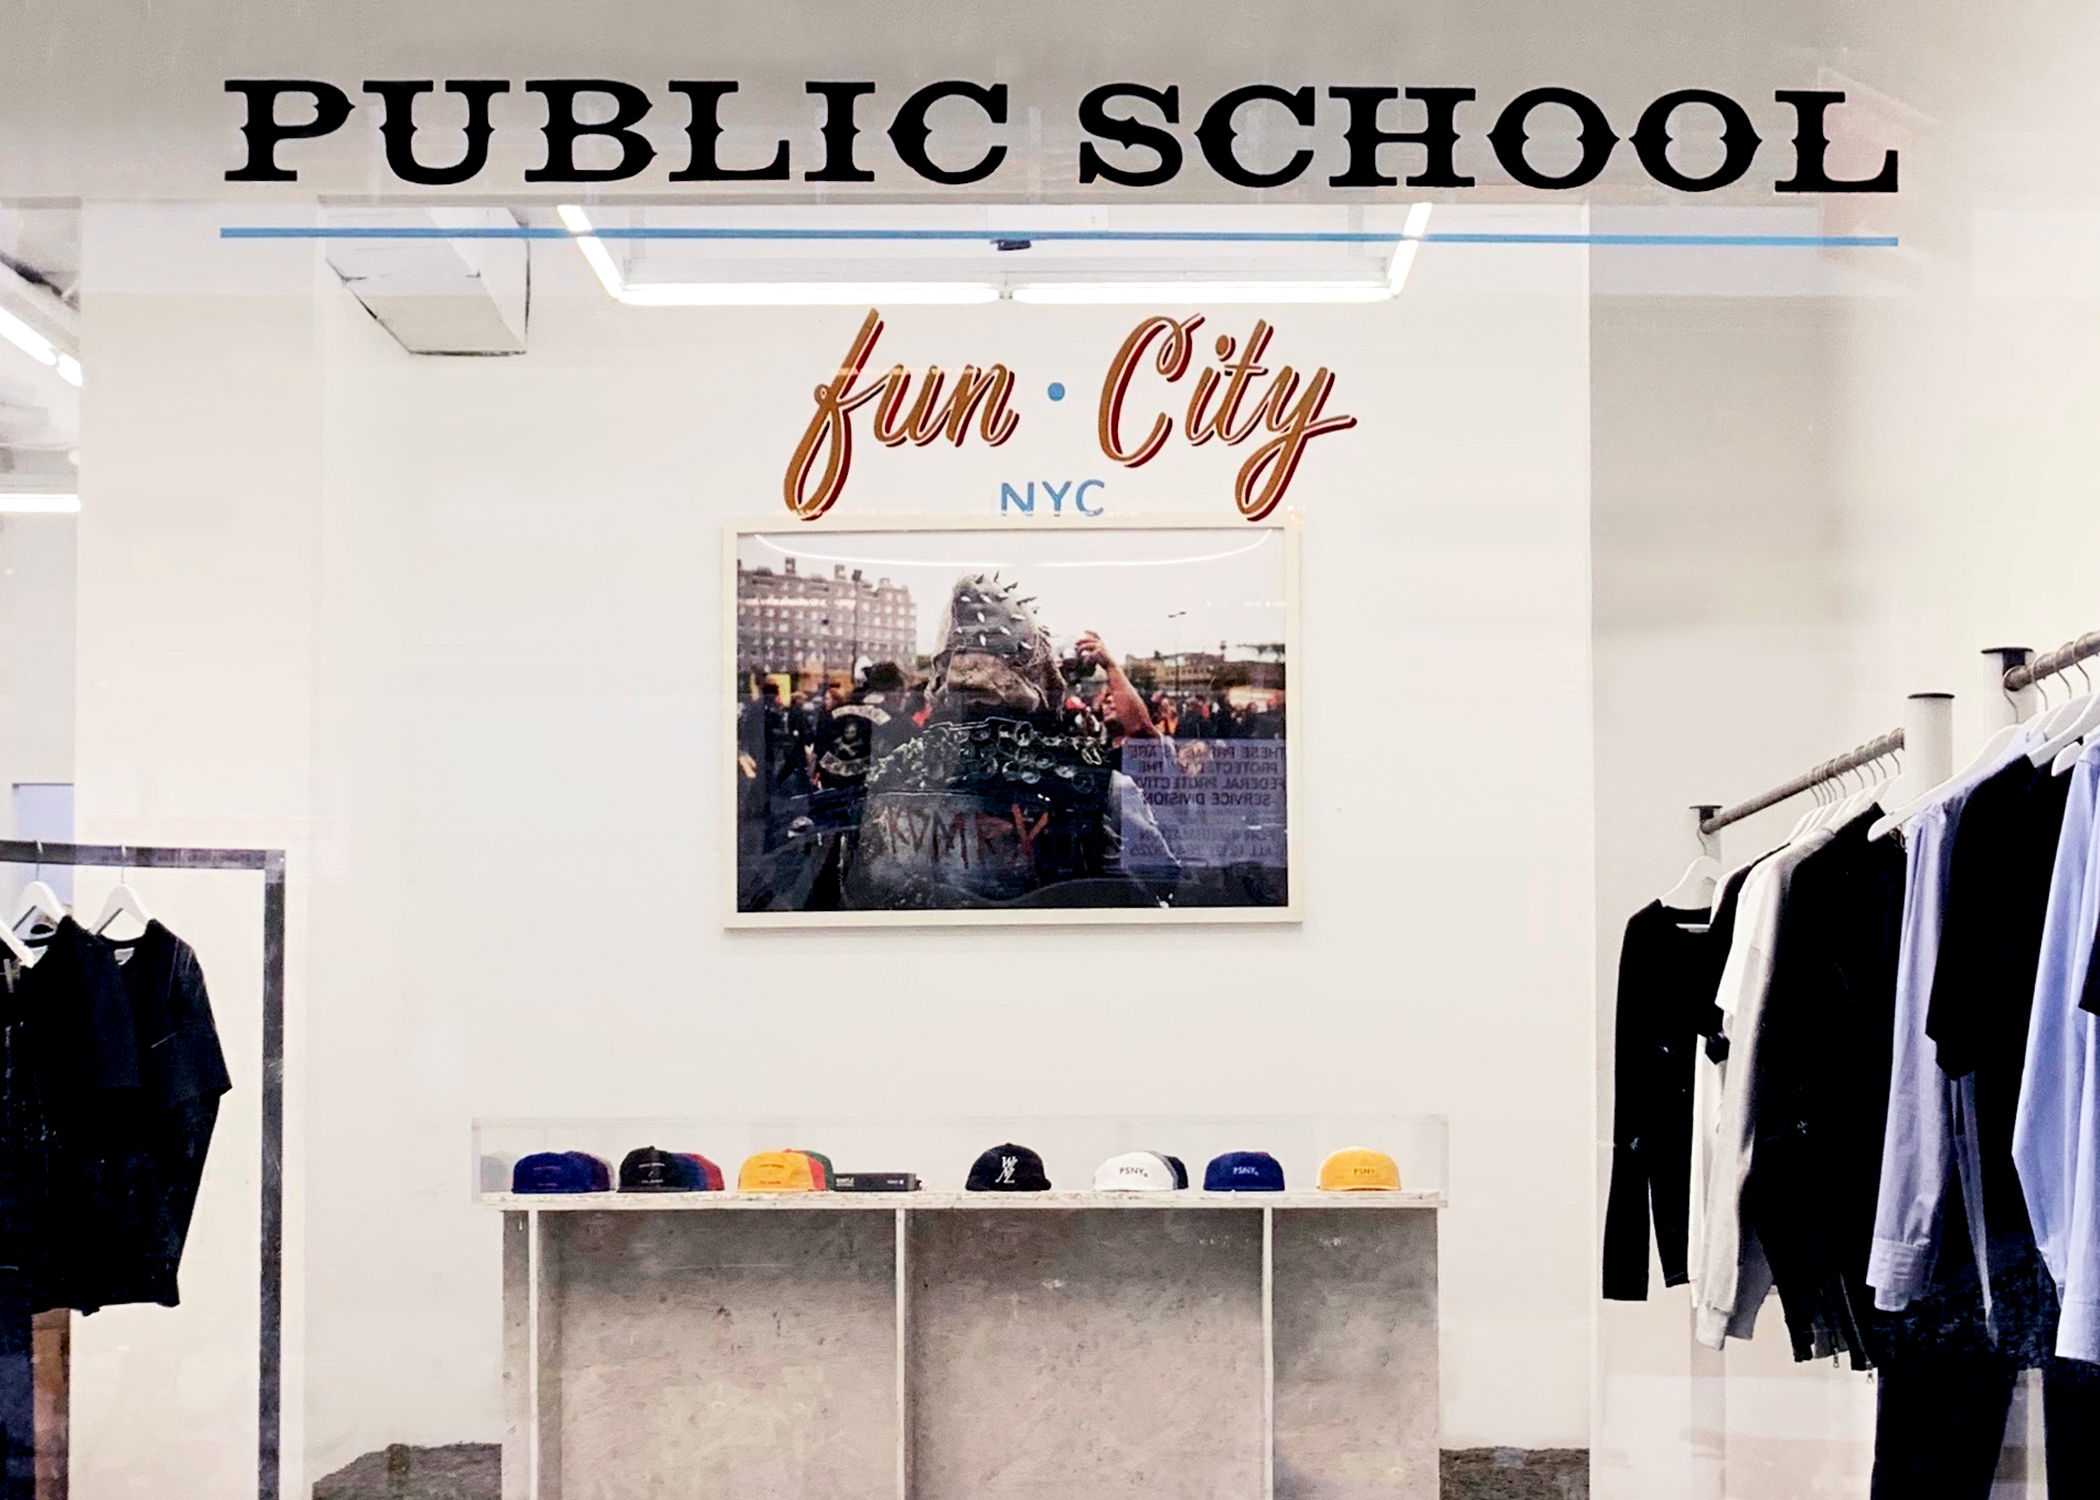 Guesst will power a loft for Public School next month.